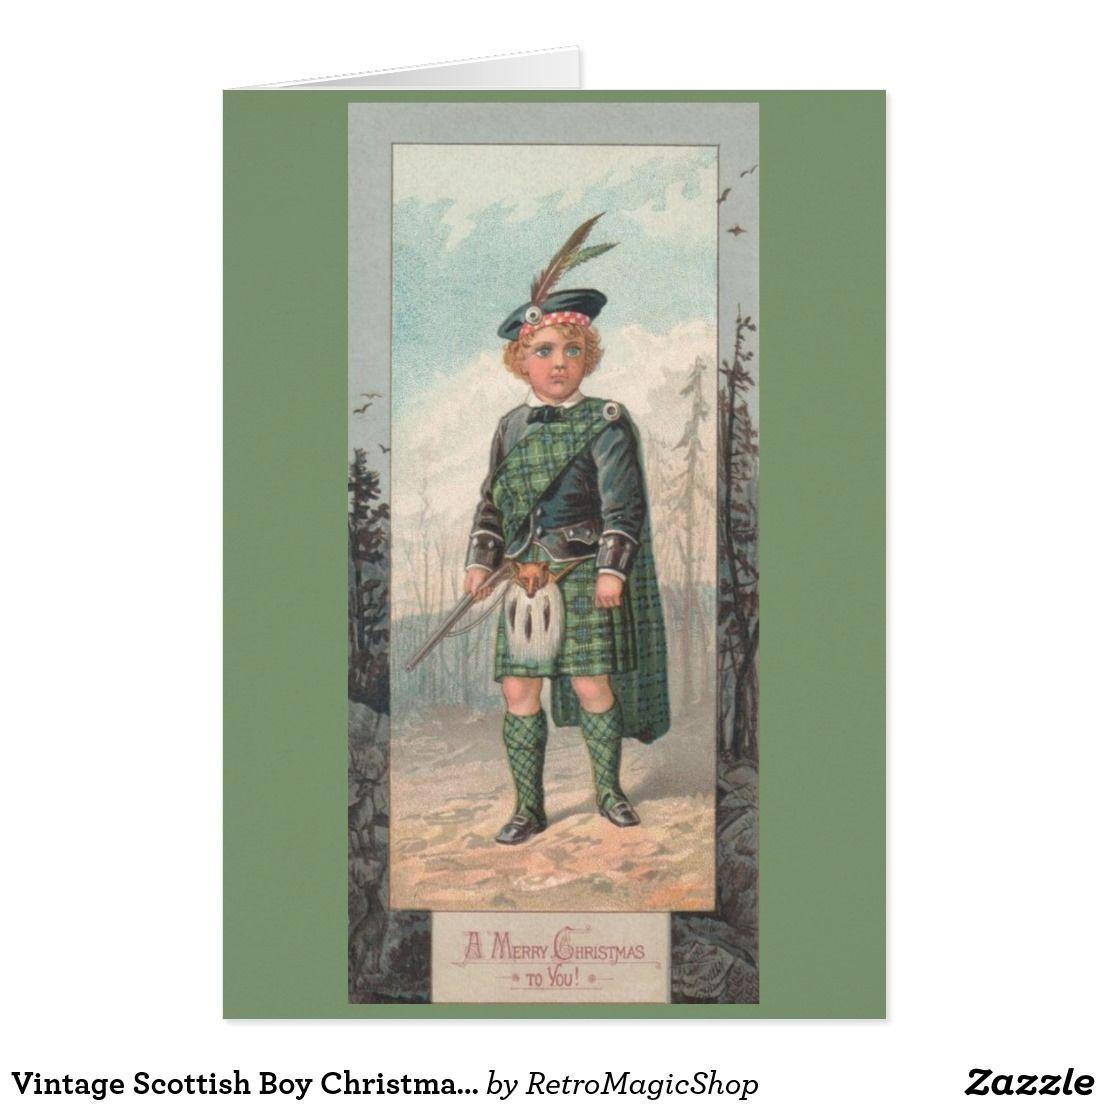 Vintage Scottish Boy Christmas Greeting Card